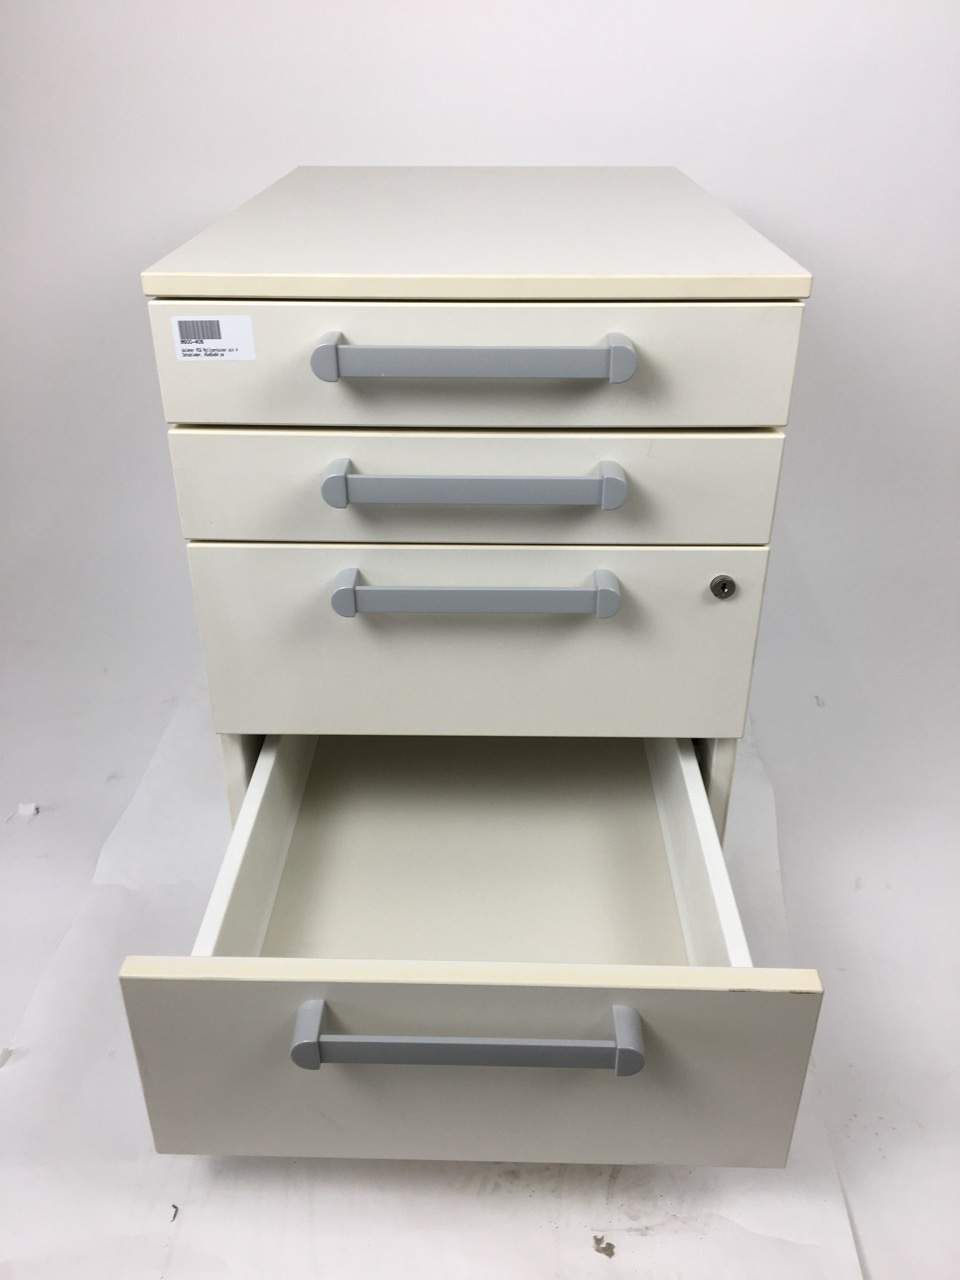 Waldner Waldner MC6 mobile cabinet, 4 drawers, 45 cm width, 64cm height